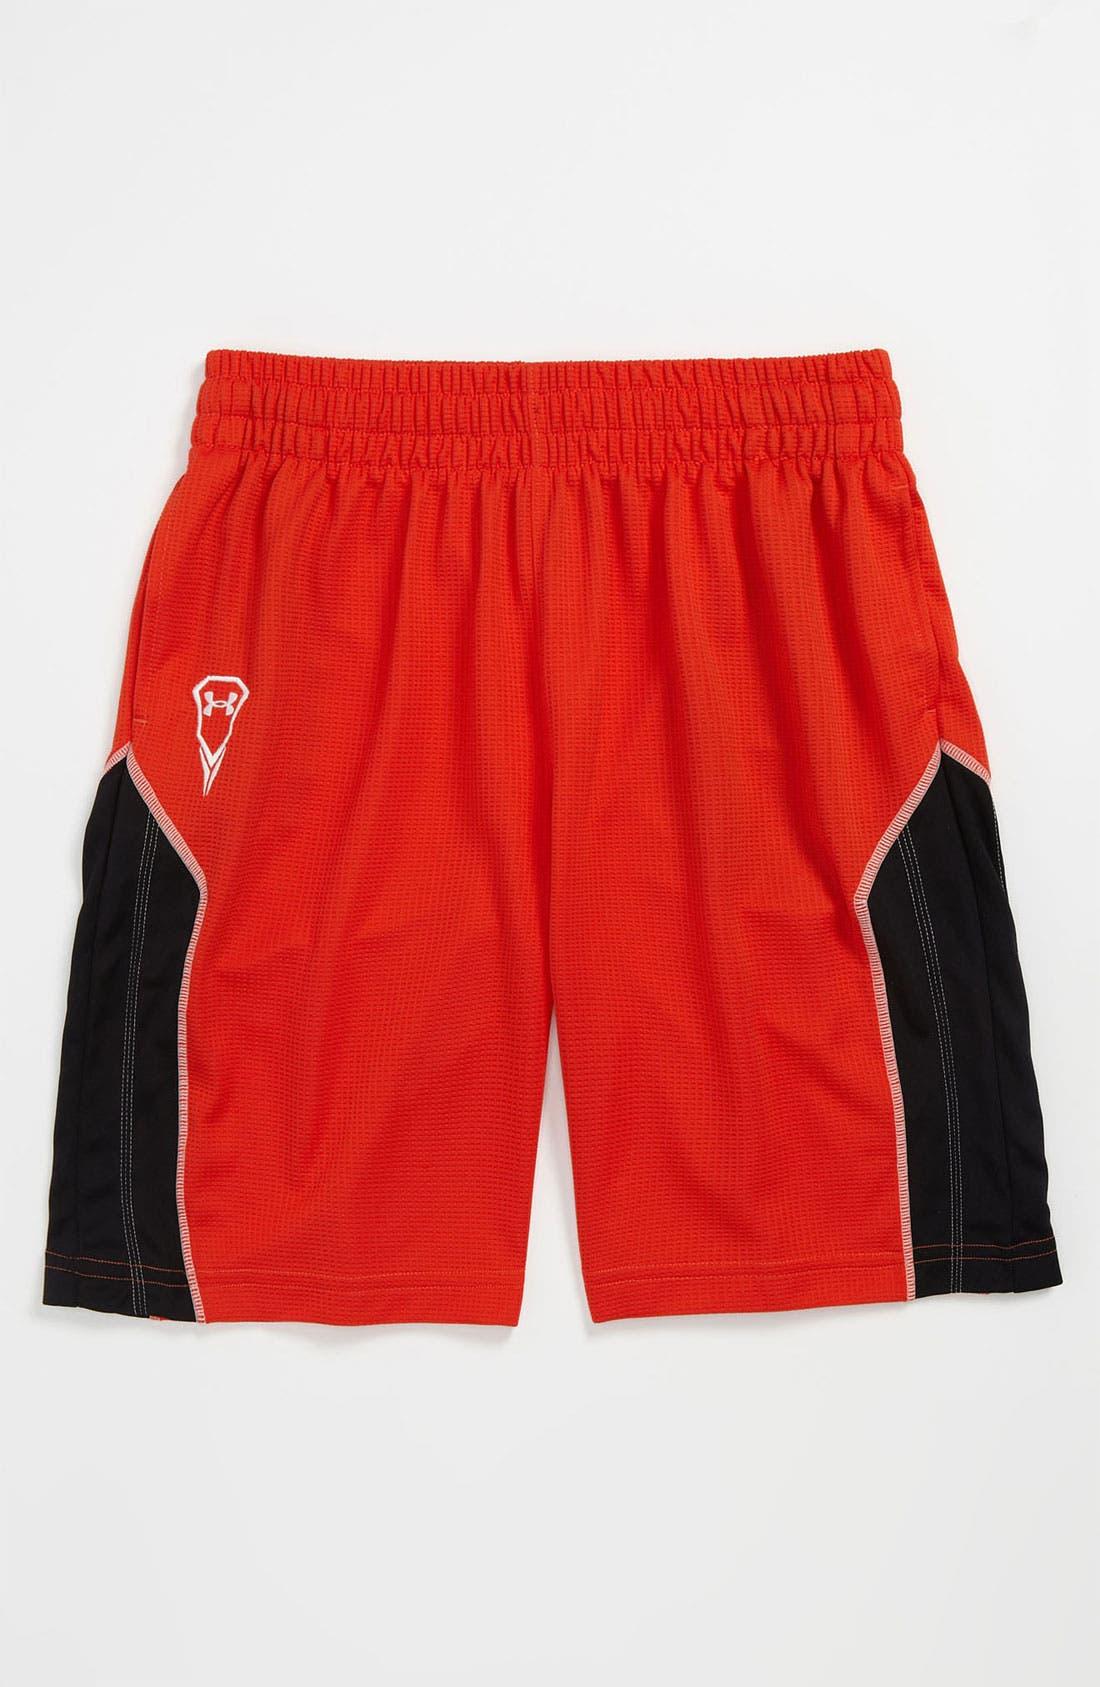 Main Image - Under Armour Shorts (Big Boys)